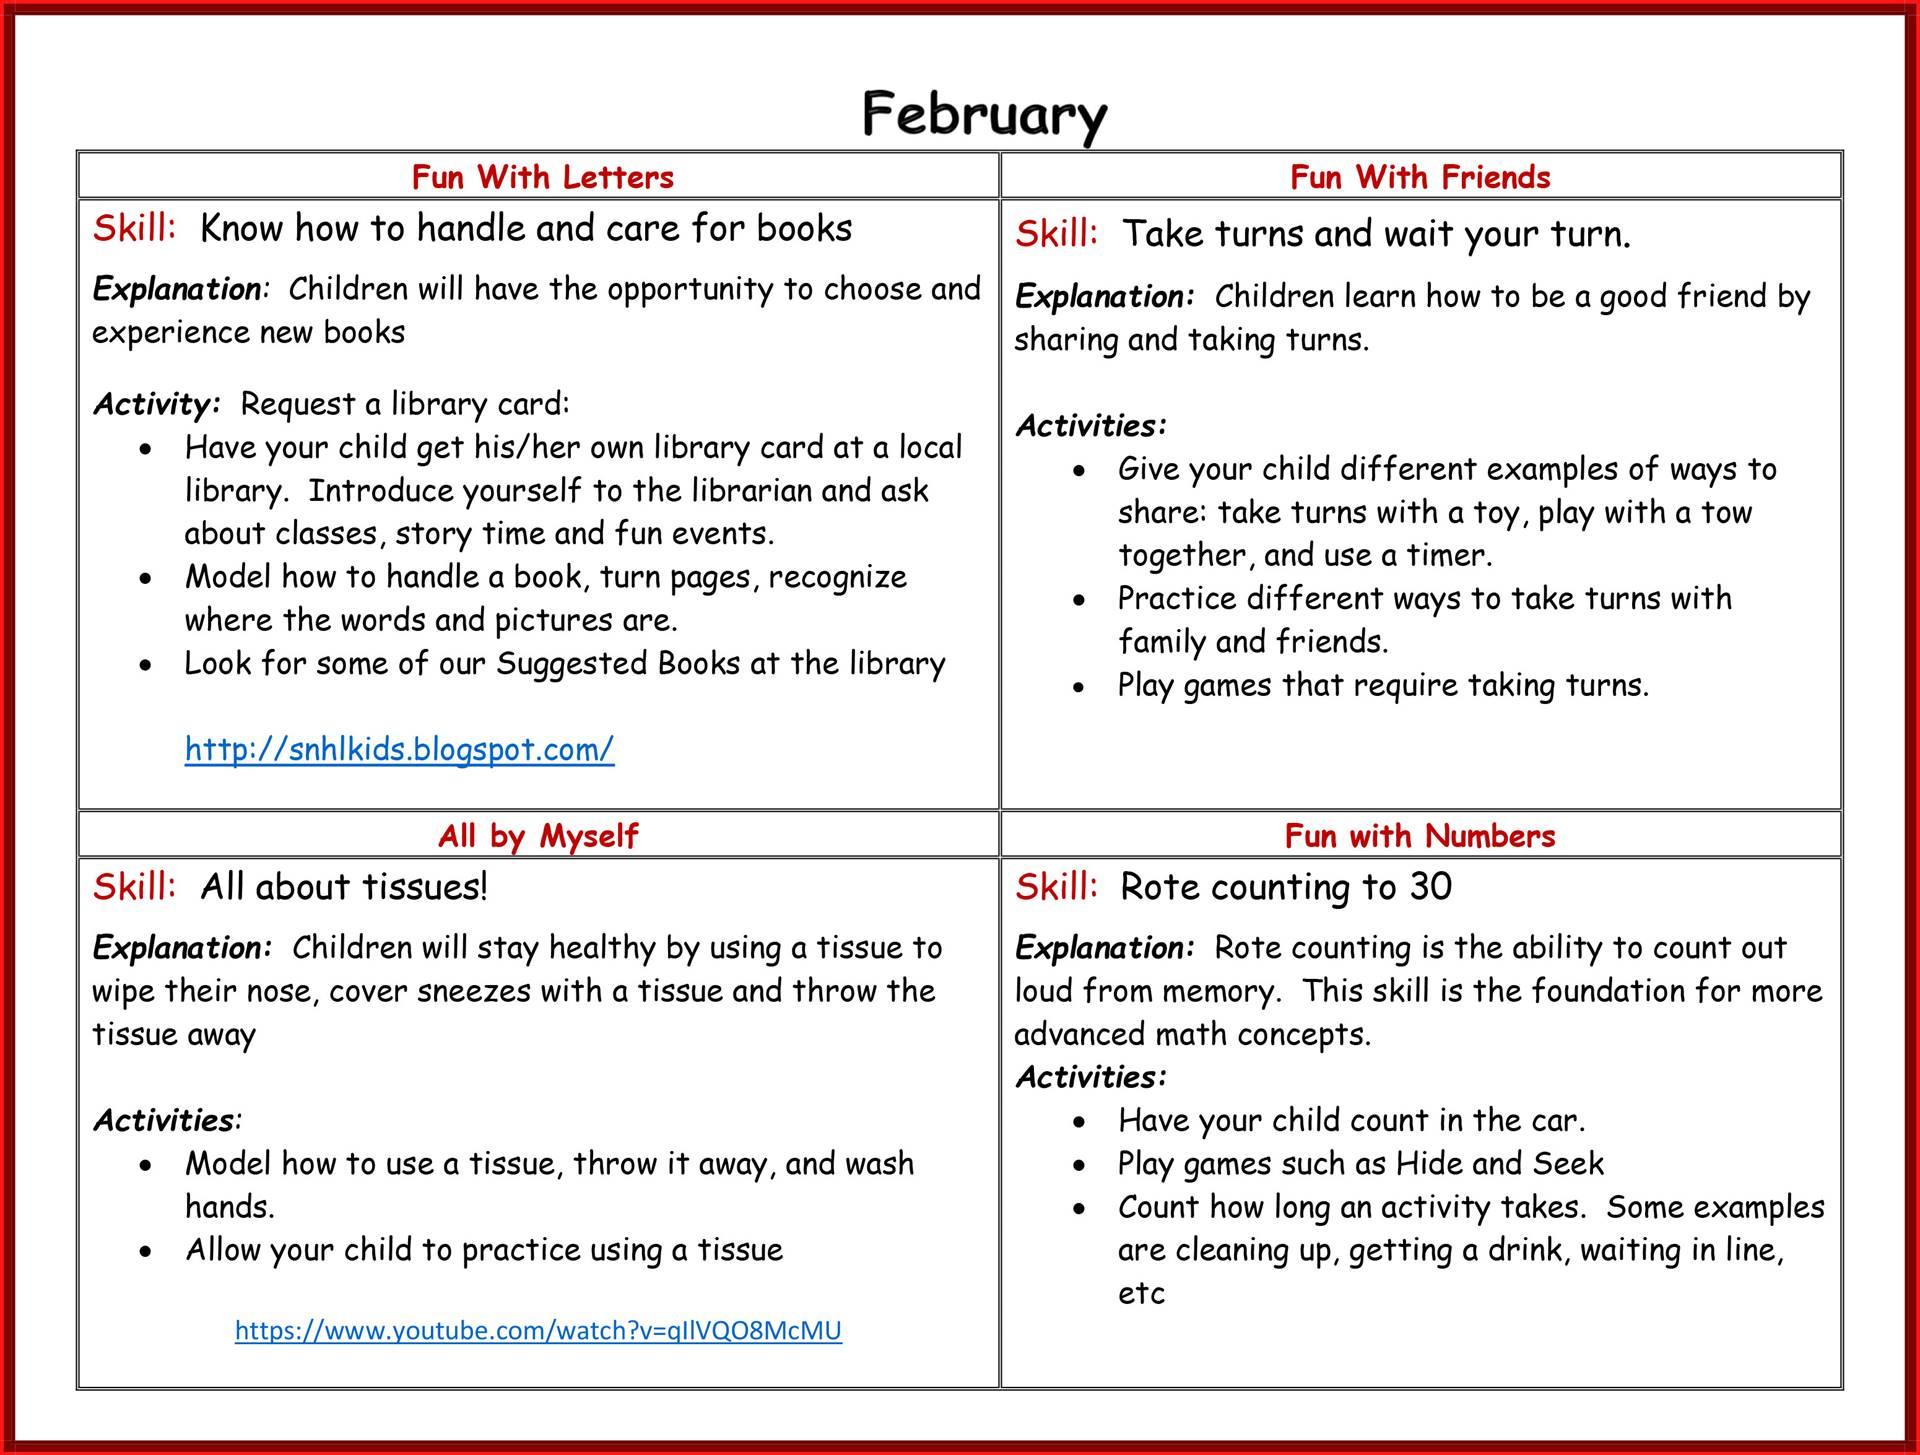 Kindergarten Readiness Calendar - February page 2